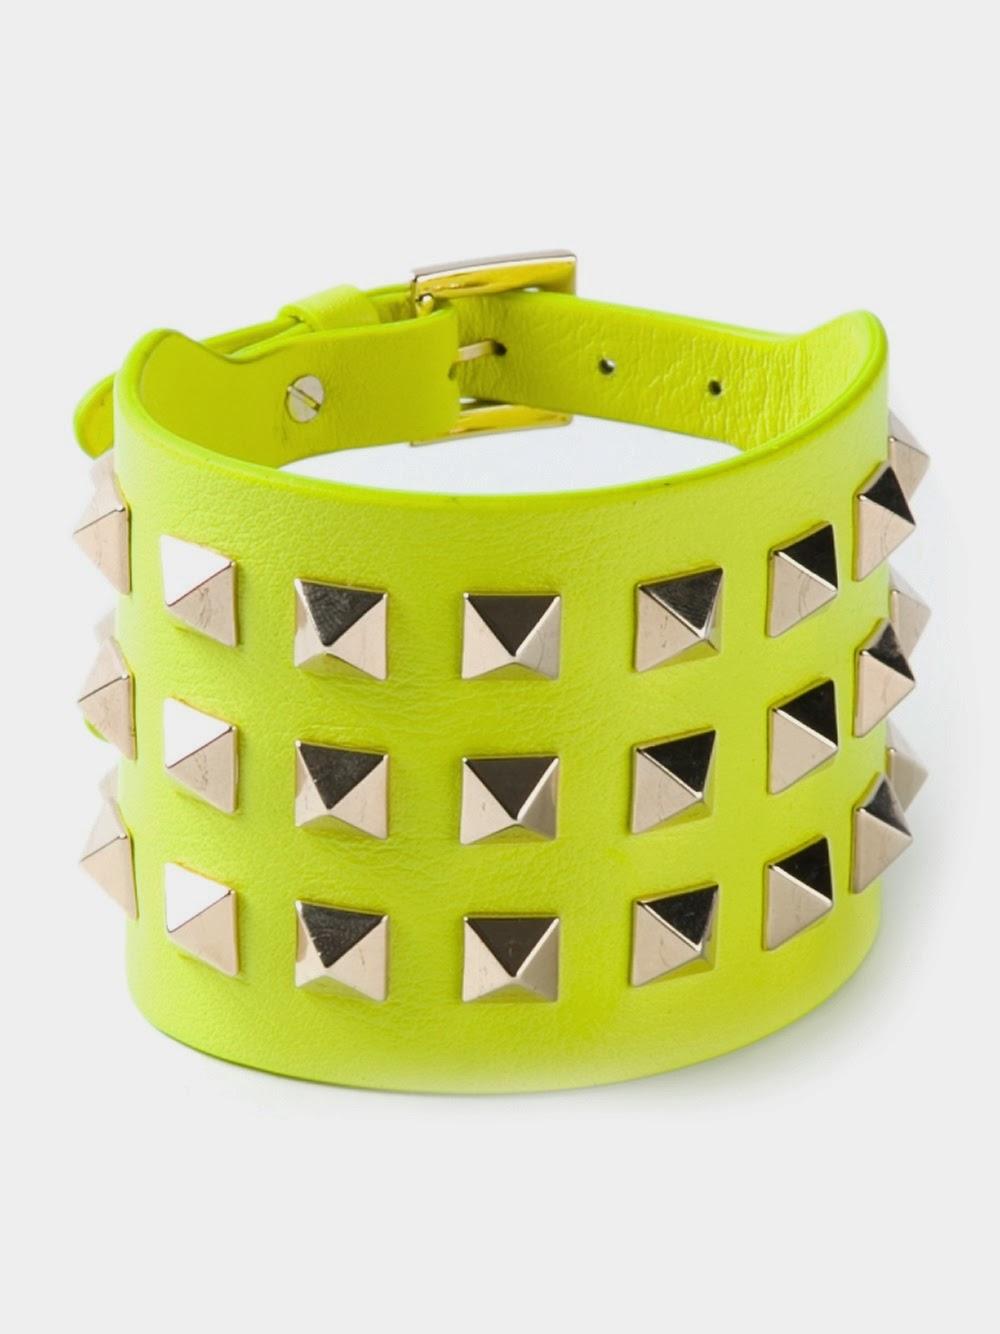 http://www.farfetch.com/shopping/women/534369-designer-valentino-garavani-rockstud-cuff-item-10594705.aspx